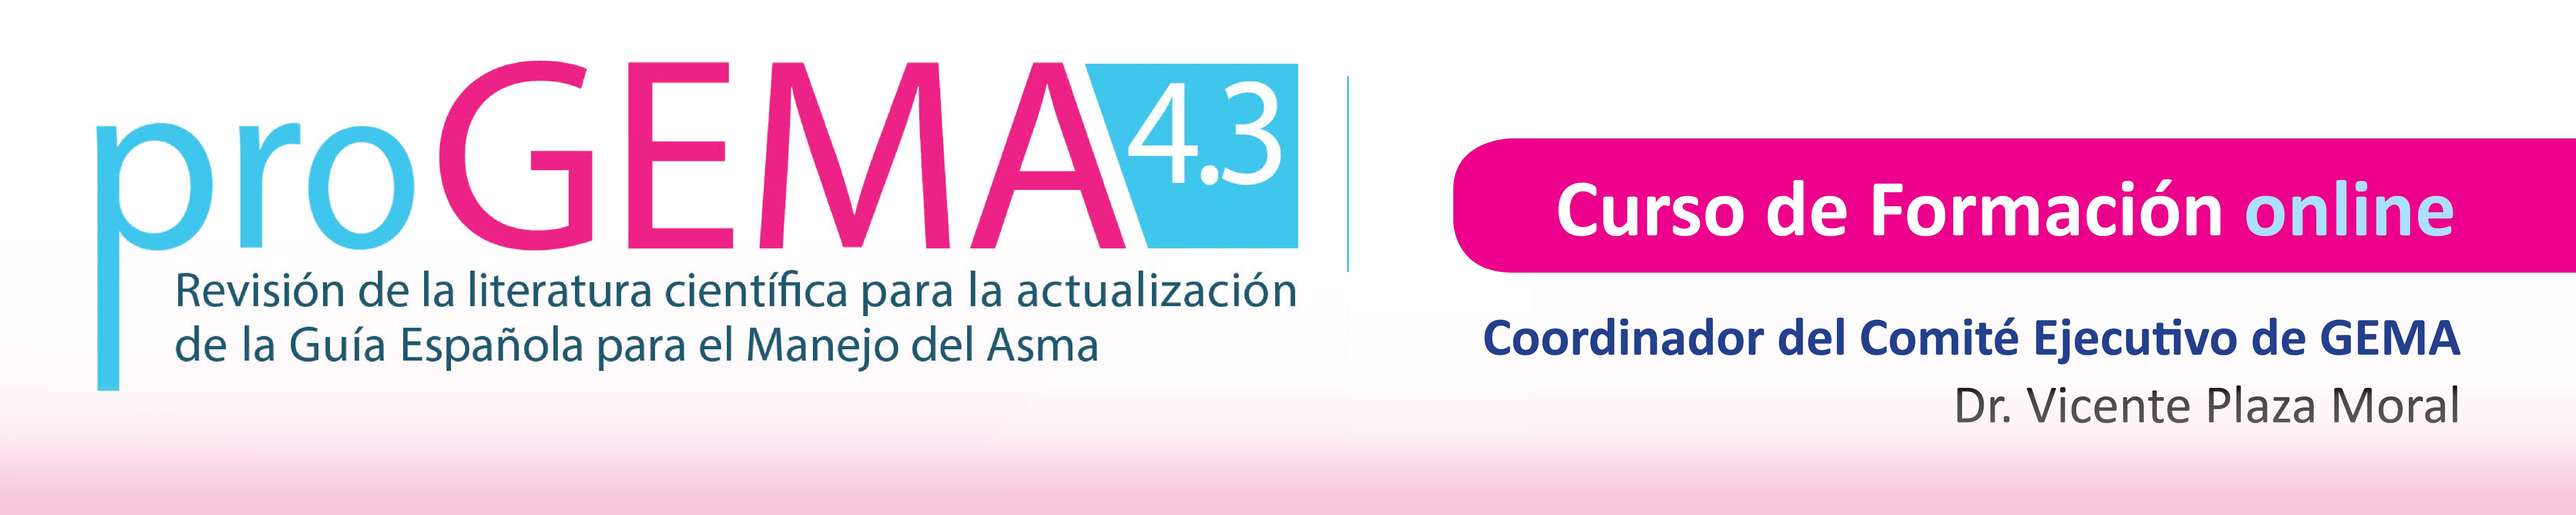 ProGema 4.3-web-03